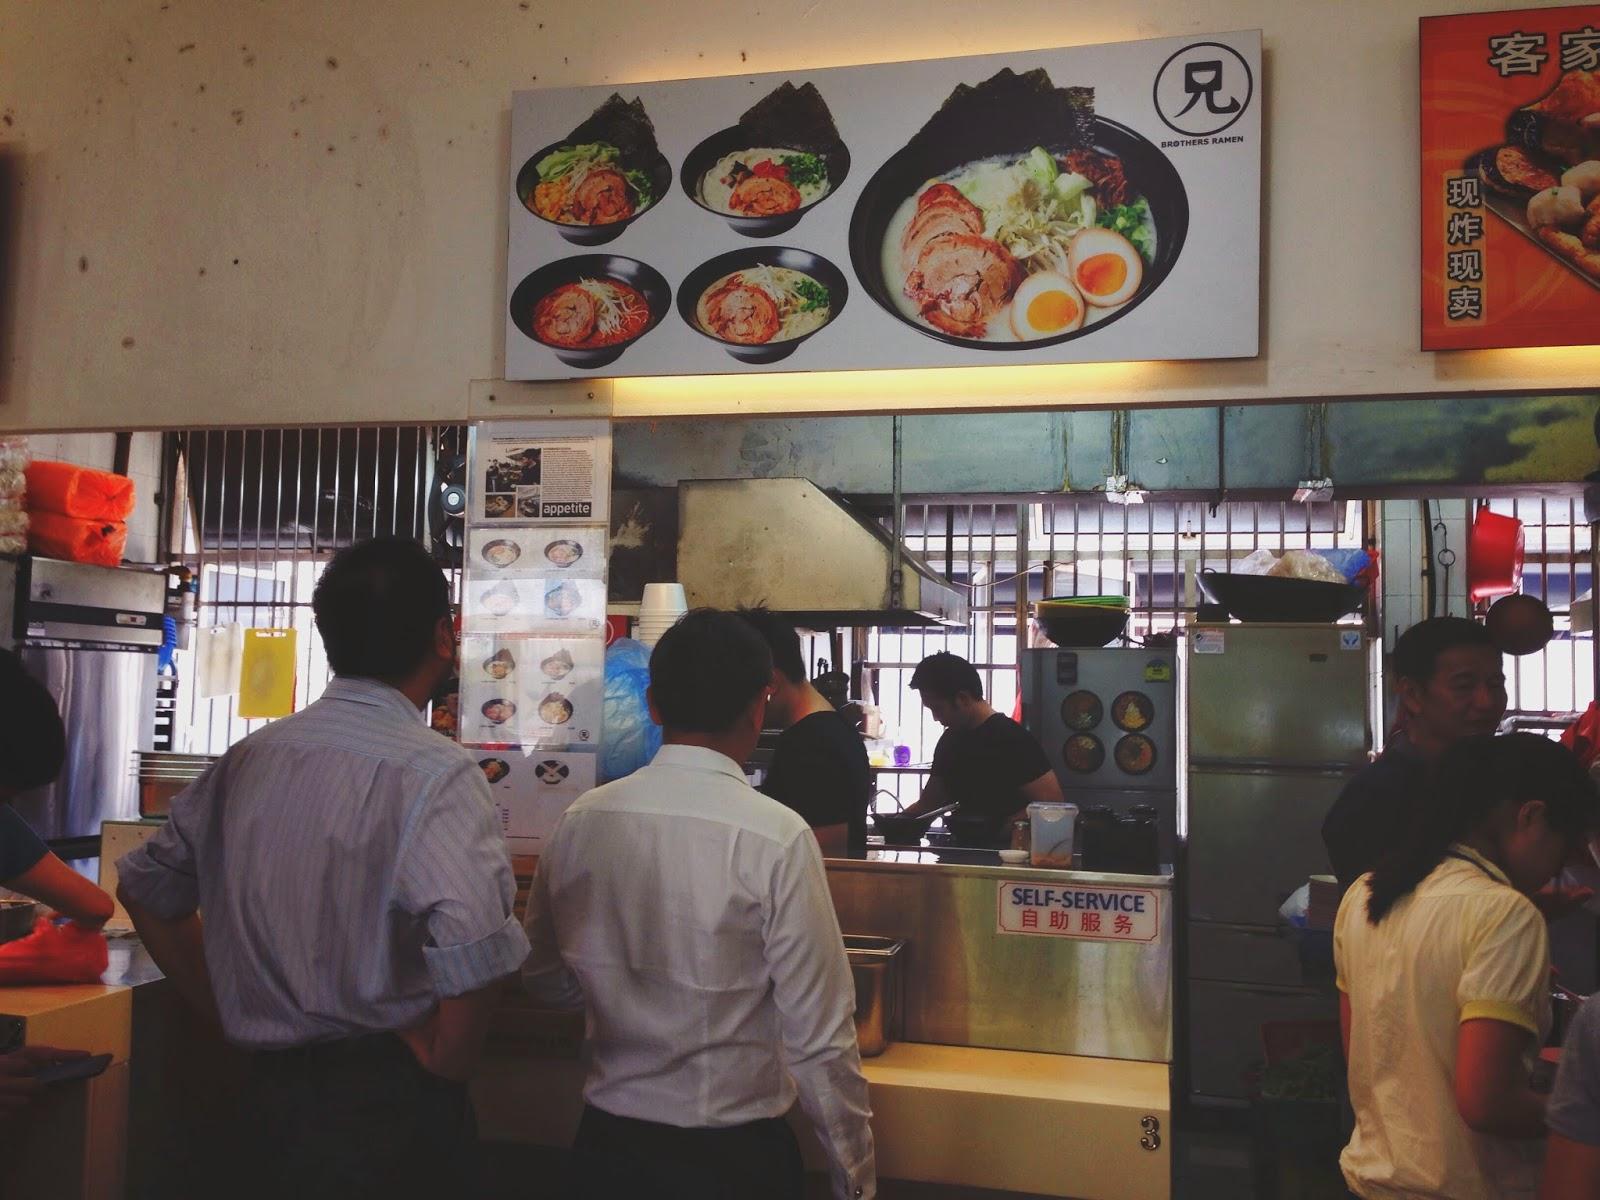 Brothers Ramen Tanjong Pagar Plaza Coffeeshop